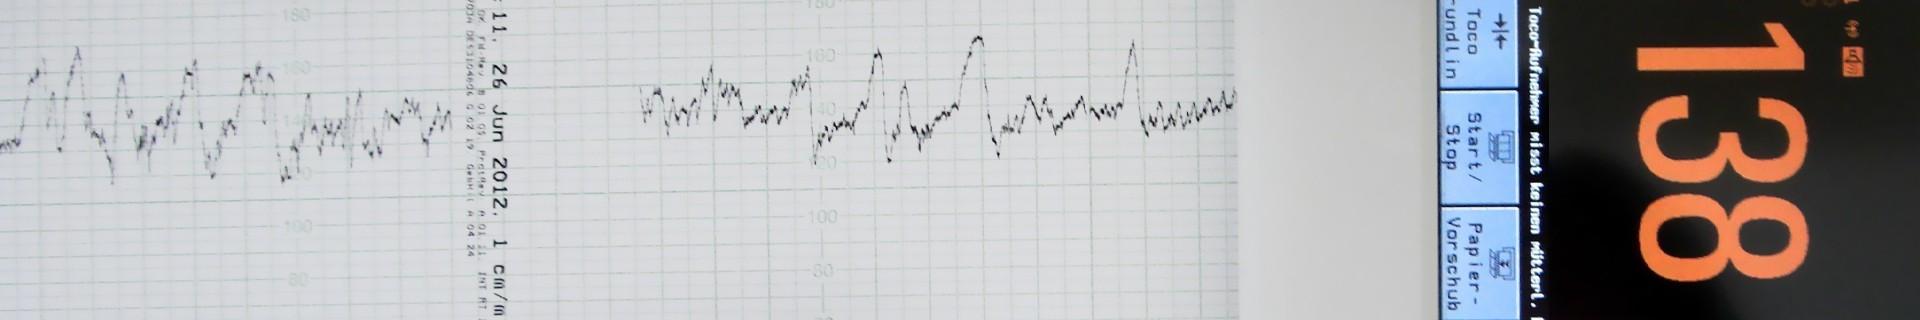 Cardiotocografe